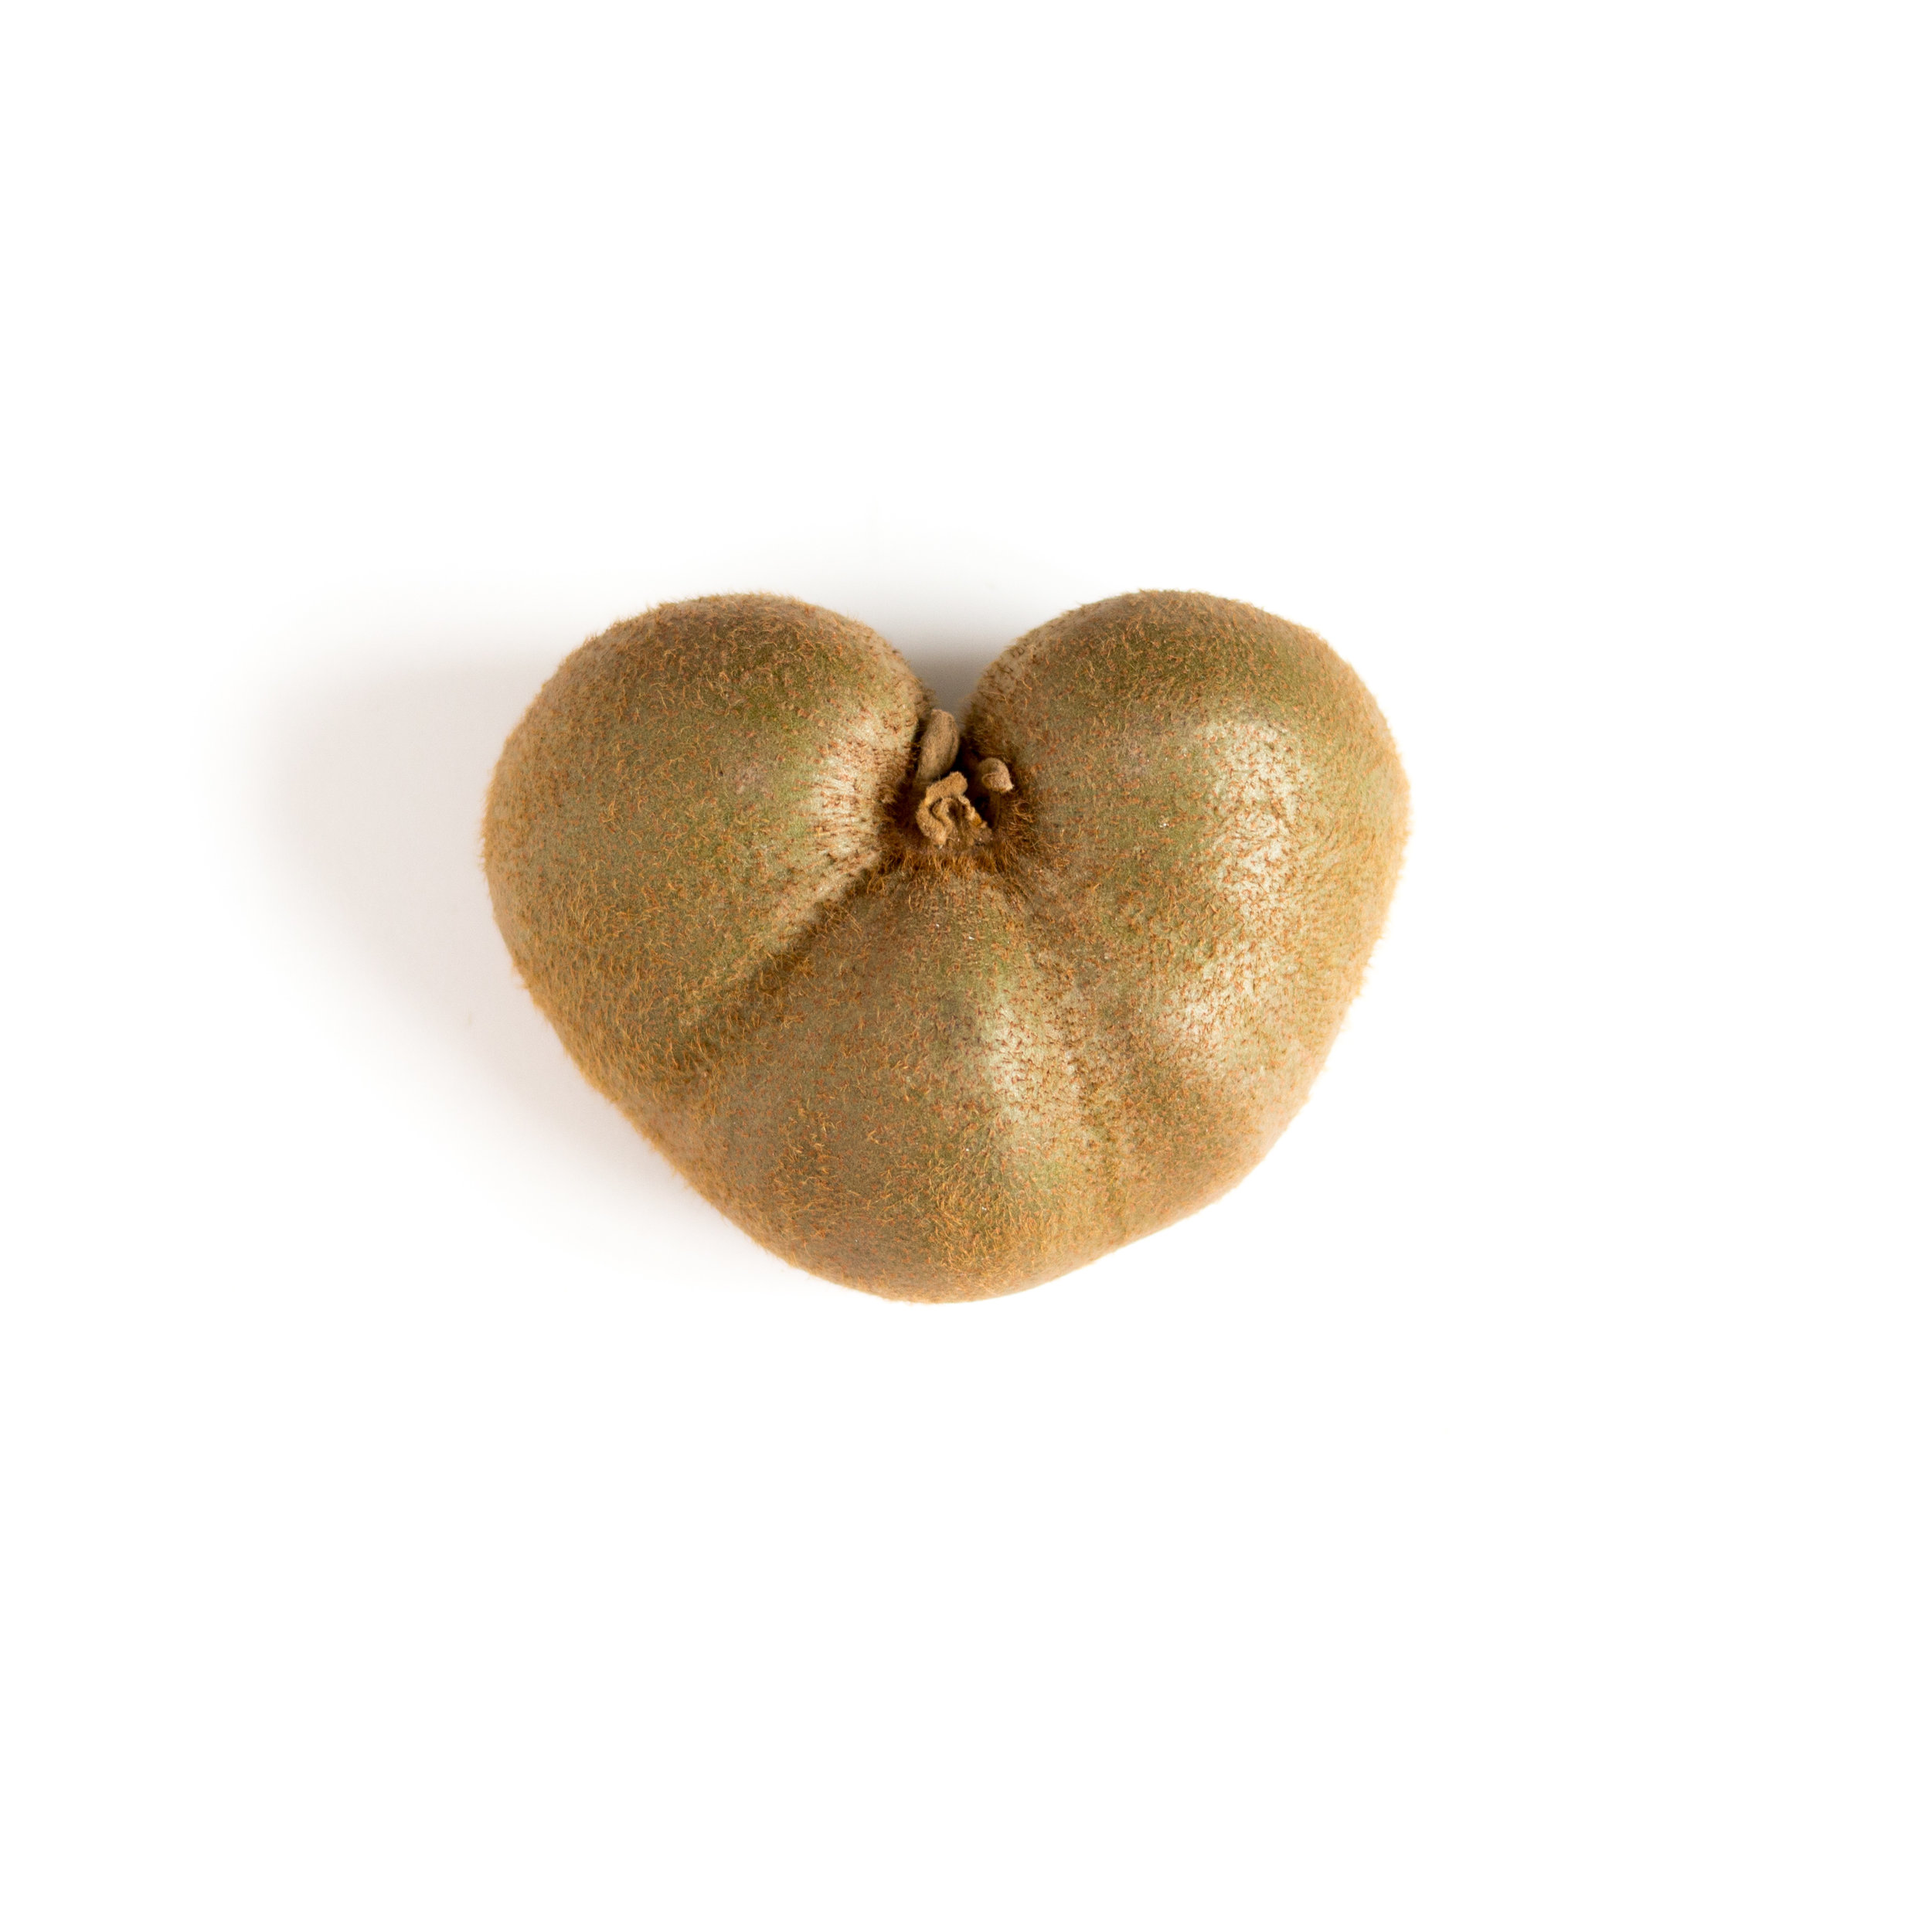 HEART Kiwi (2).jpg